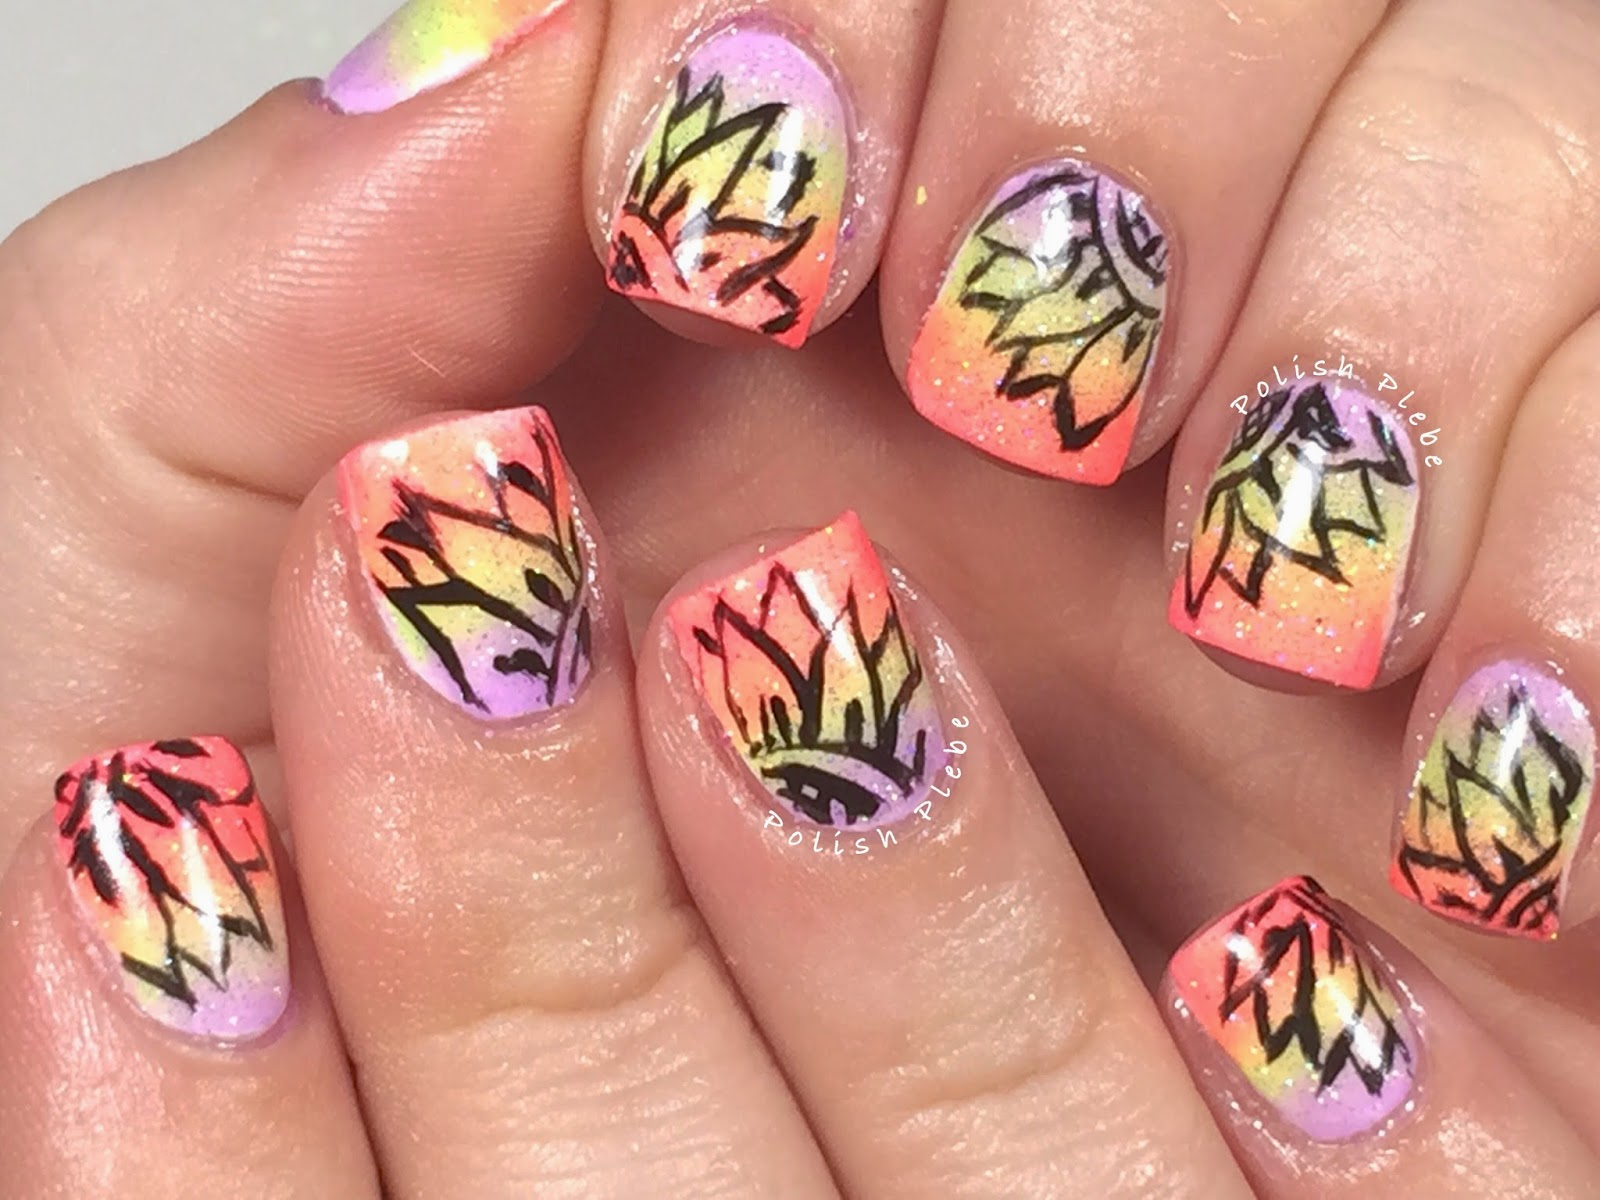 Nails Art: Outline Flower over Gradient